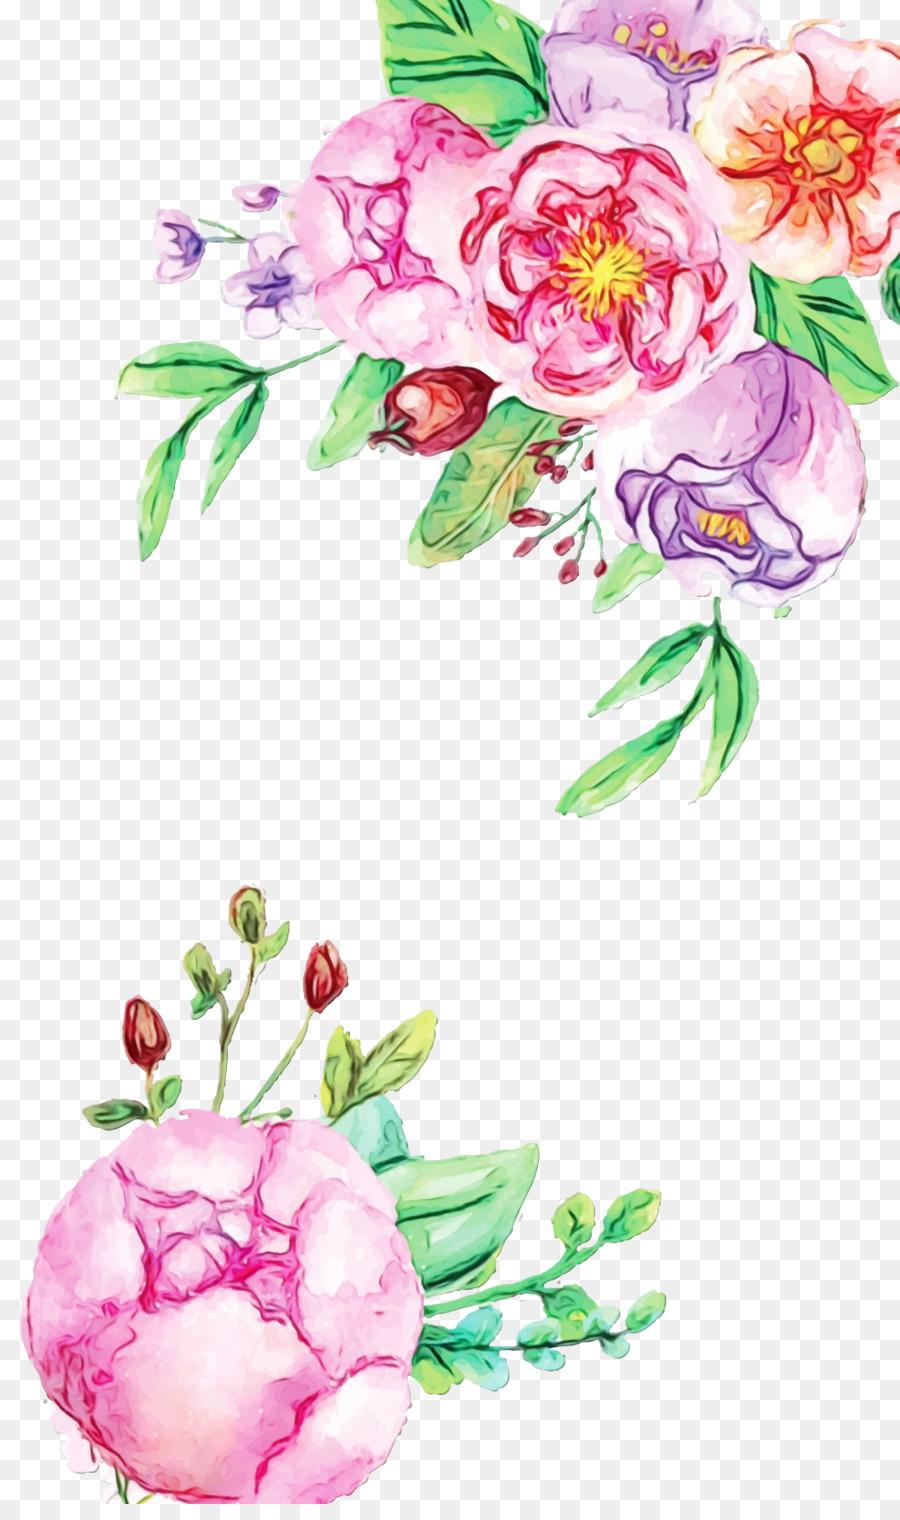 Pastel Floral Background Png Download 1039 1736 Free